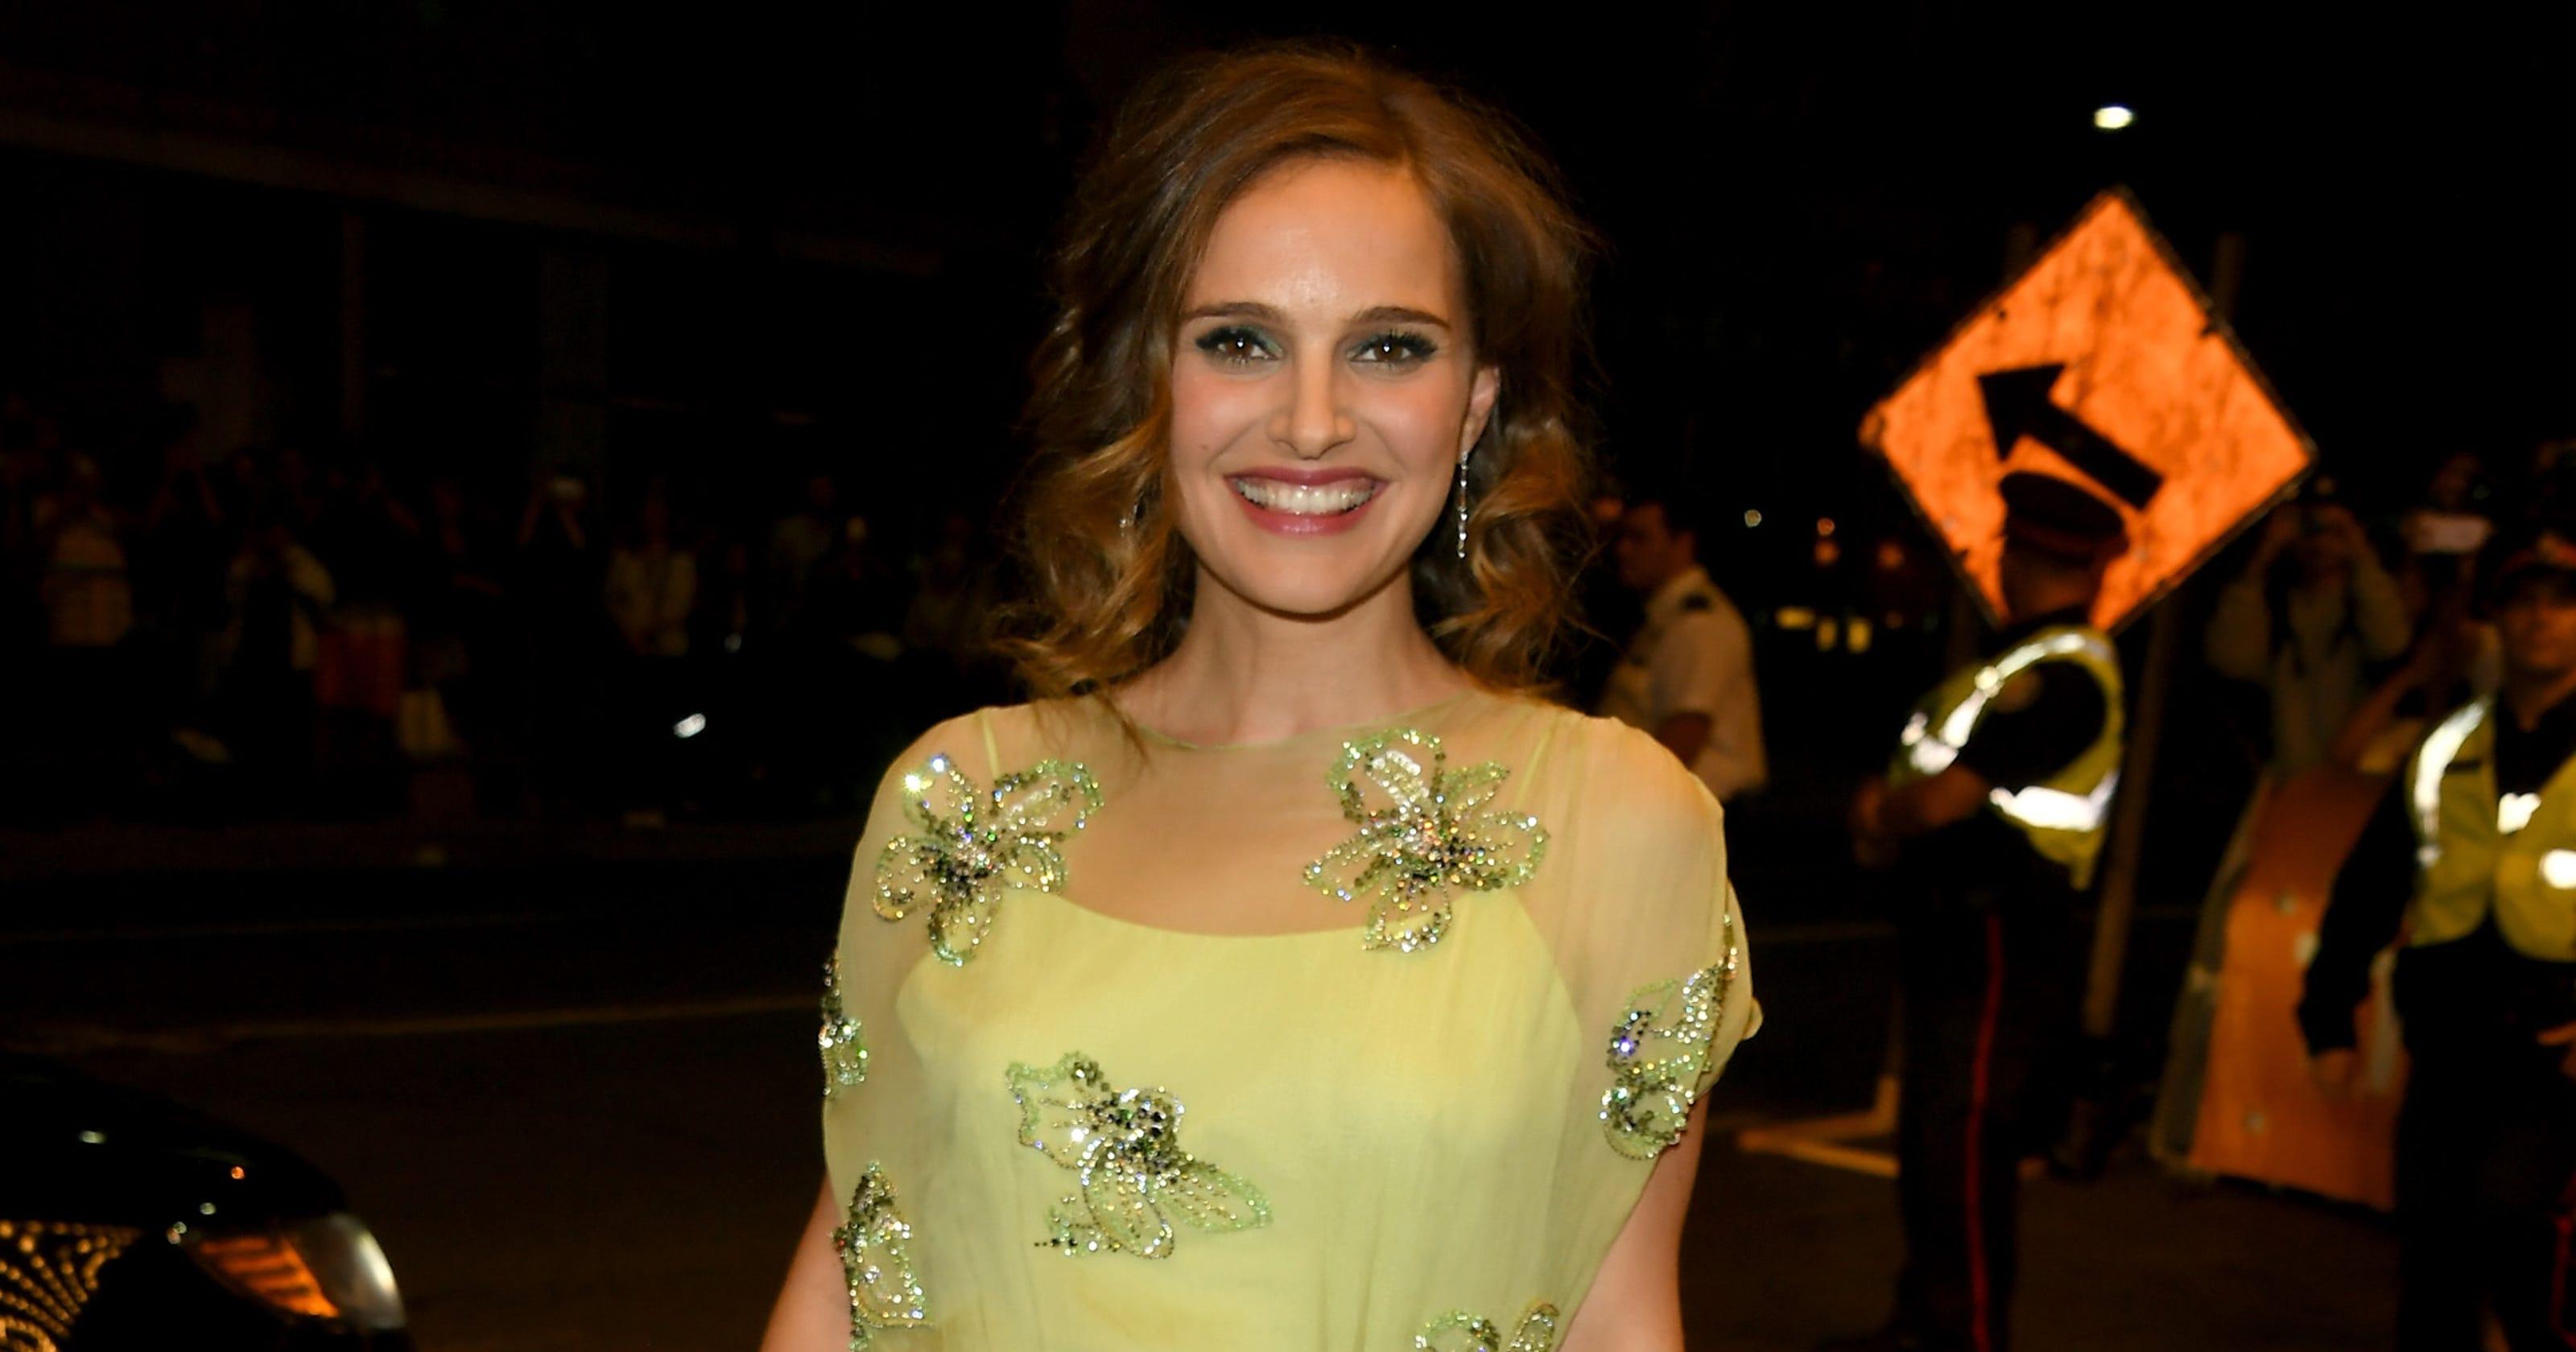 In Toronto, Natalie Portman enters Oscar race with 'Jackie'